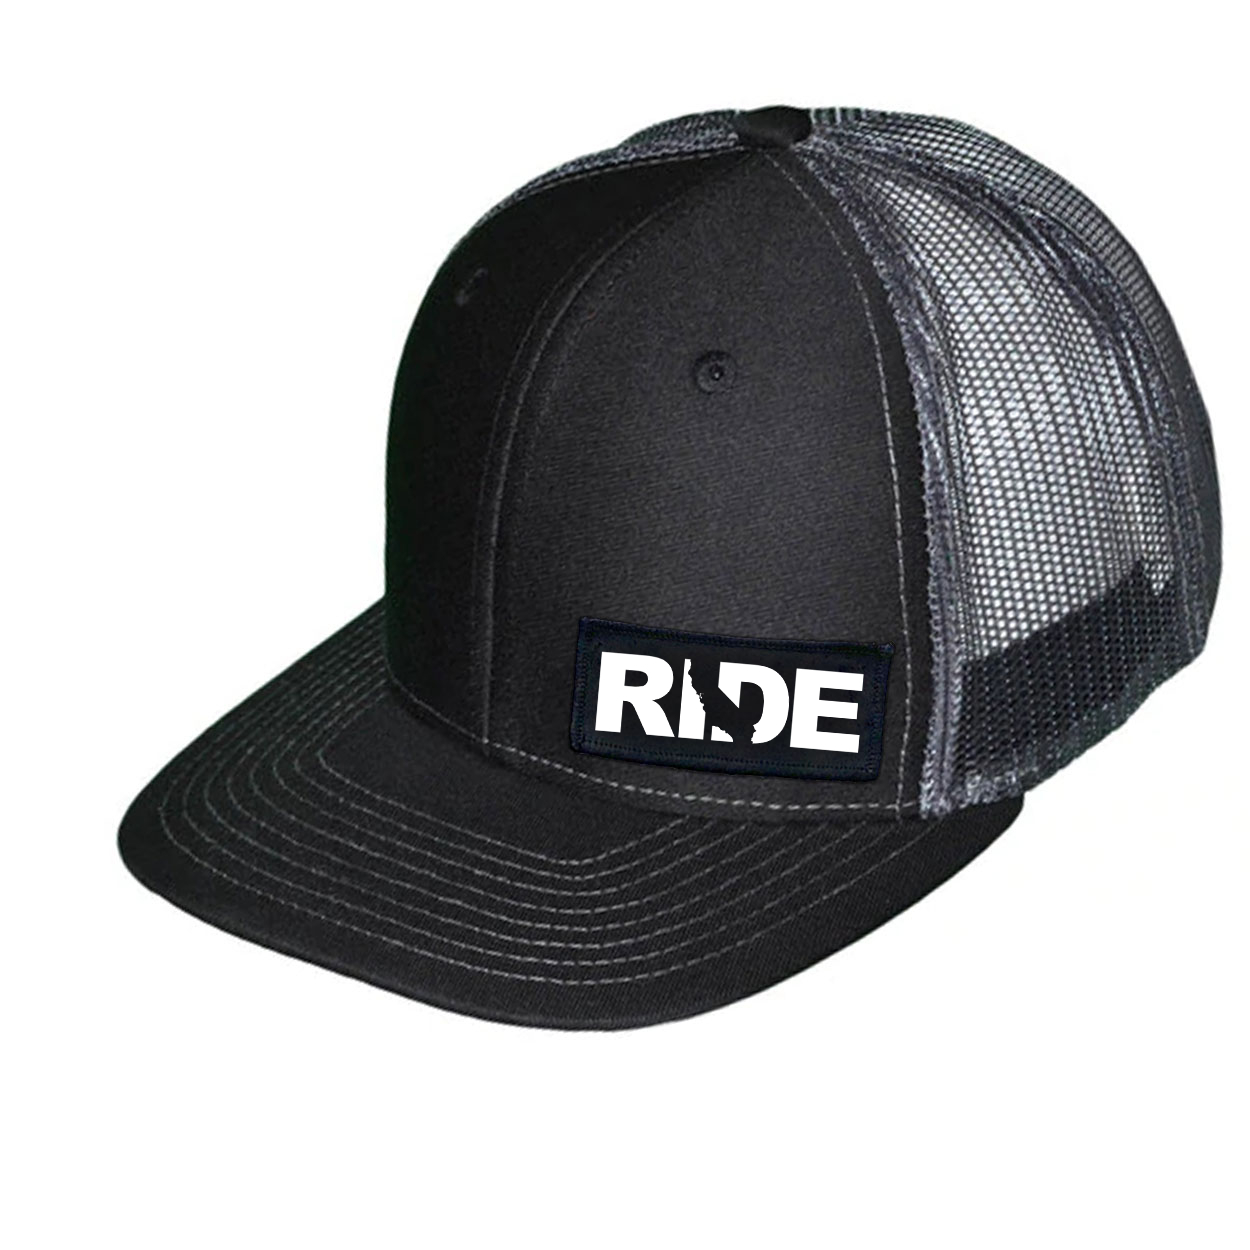 Ride California Night Out Woven Patch Snapback Trucker Hat Black/Dark Gray (White Logo)